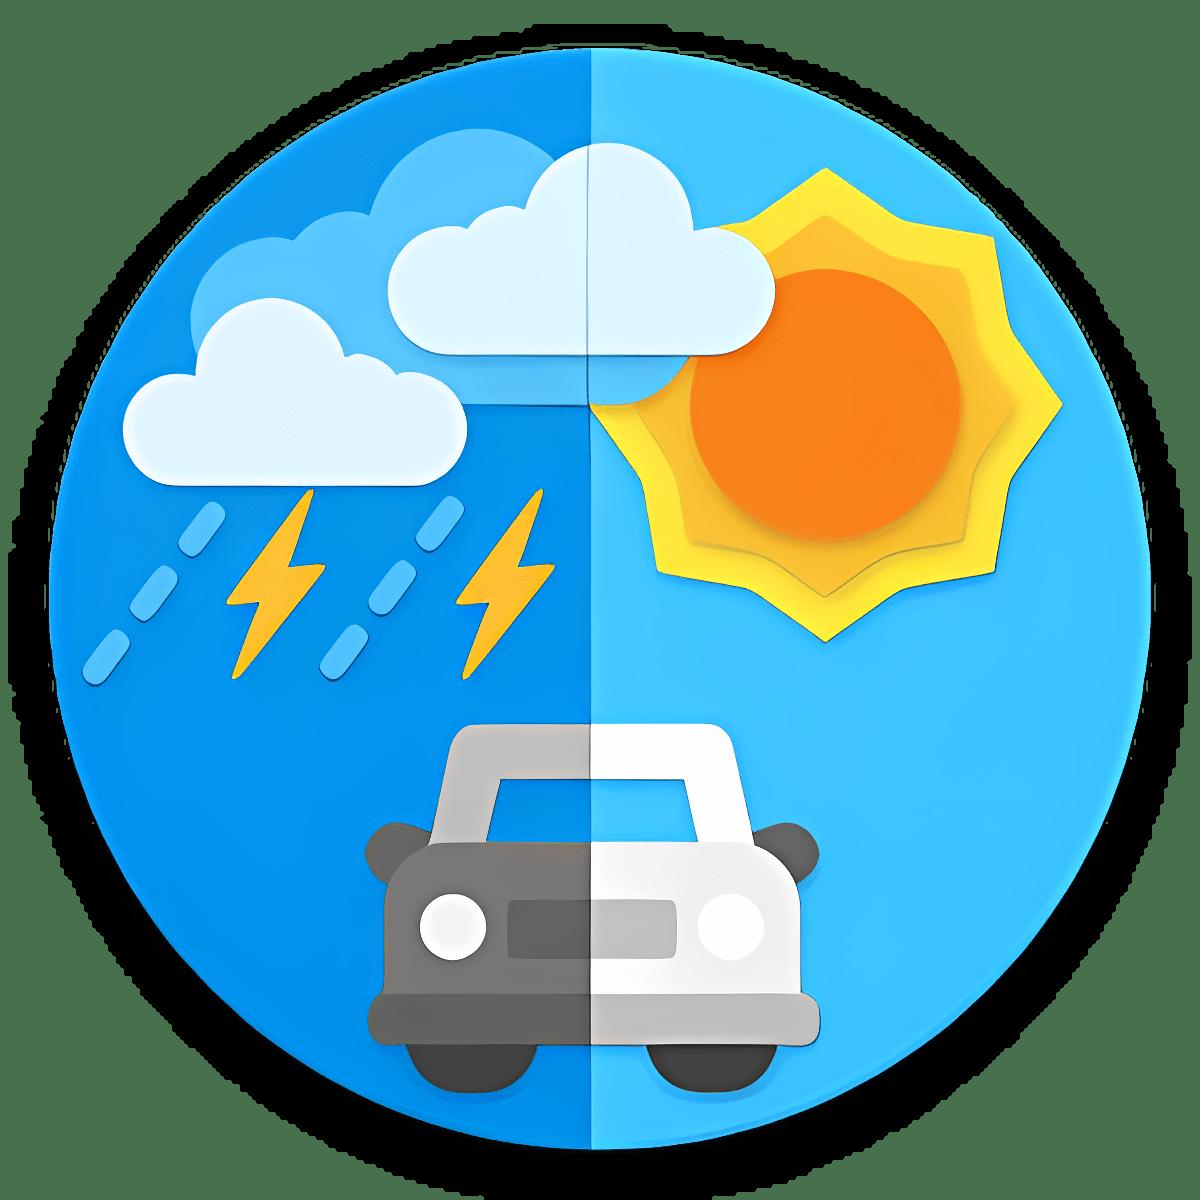 MeteoWash - can wash a car 0.2.6